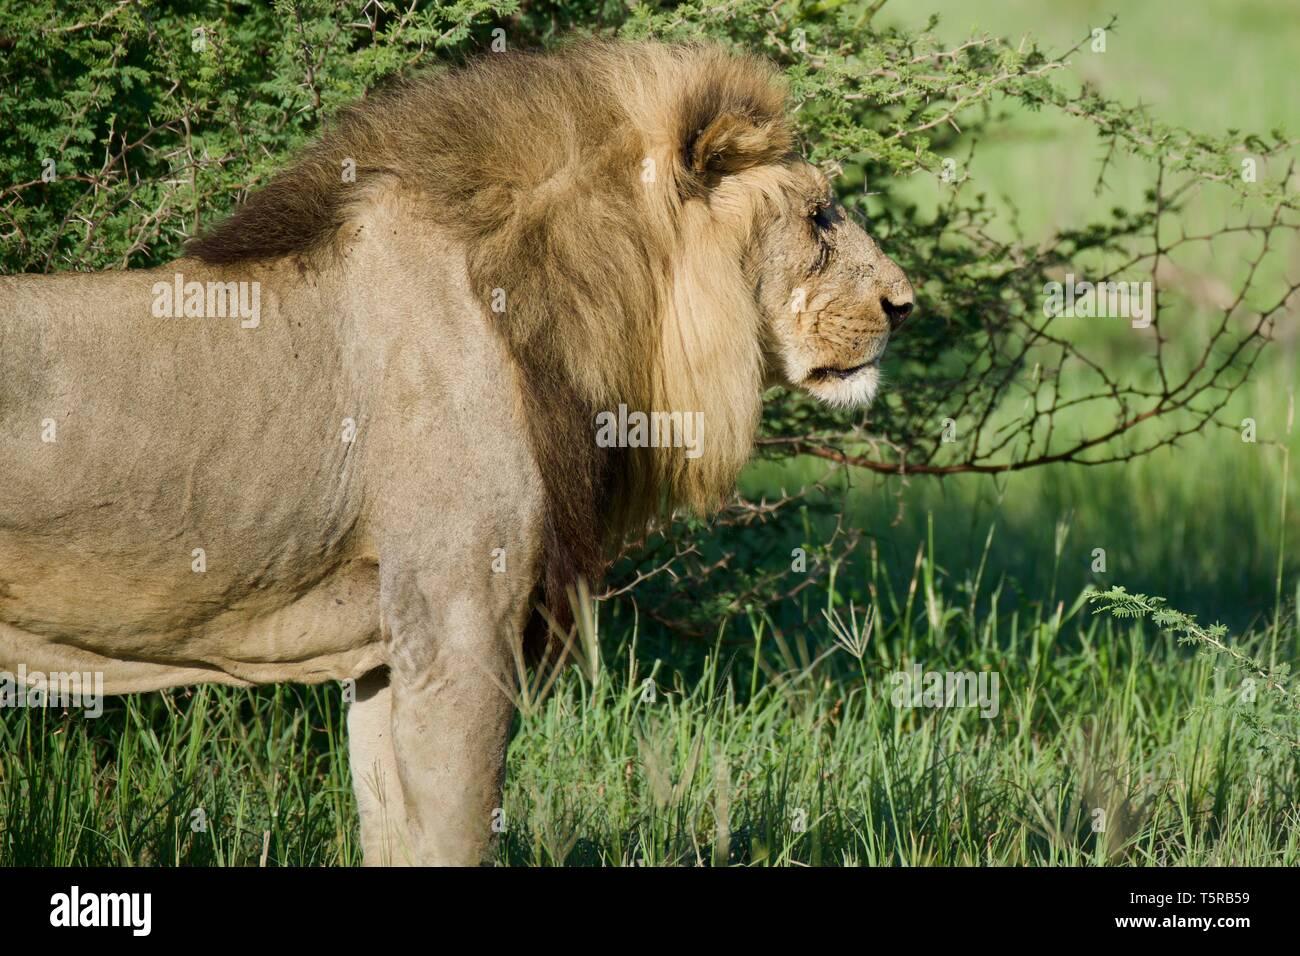 Scar Lion King Stock Photos & Scar Lion King Stock Images